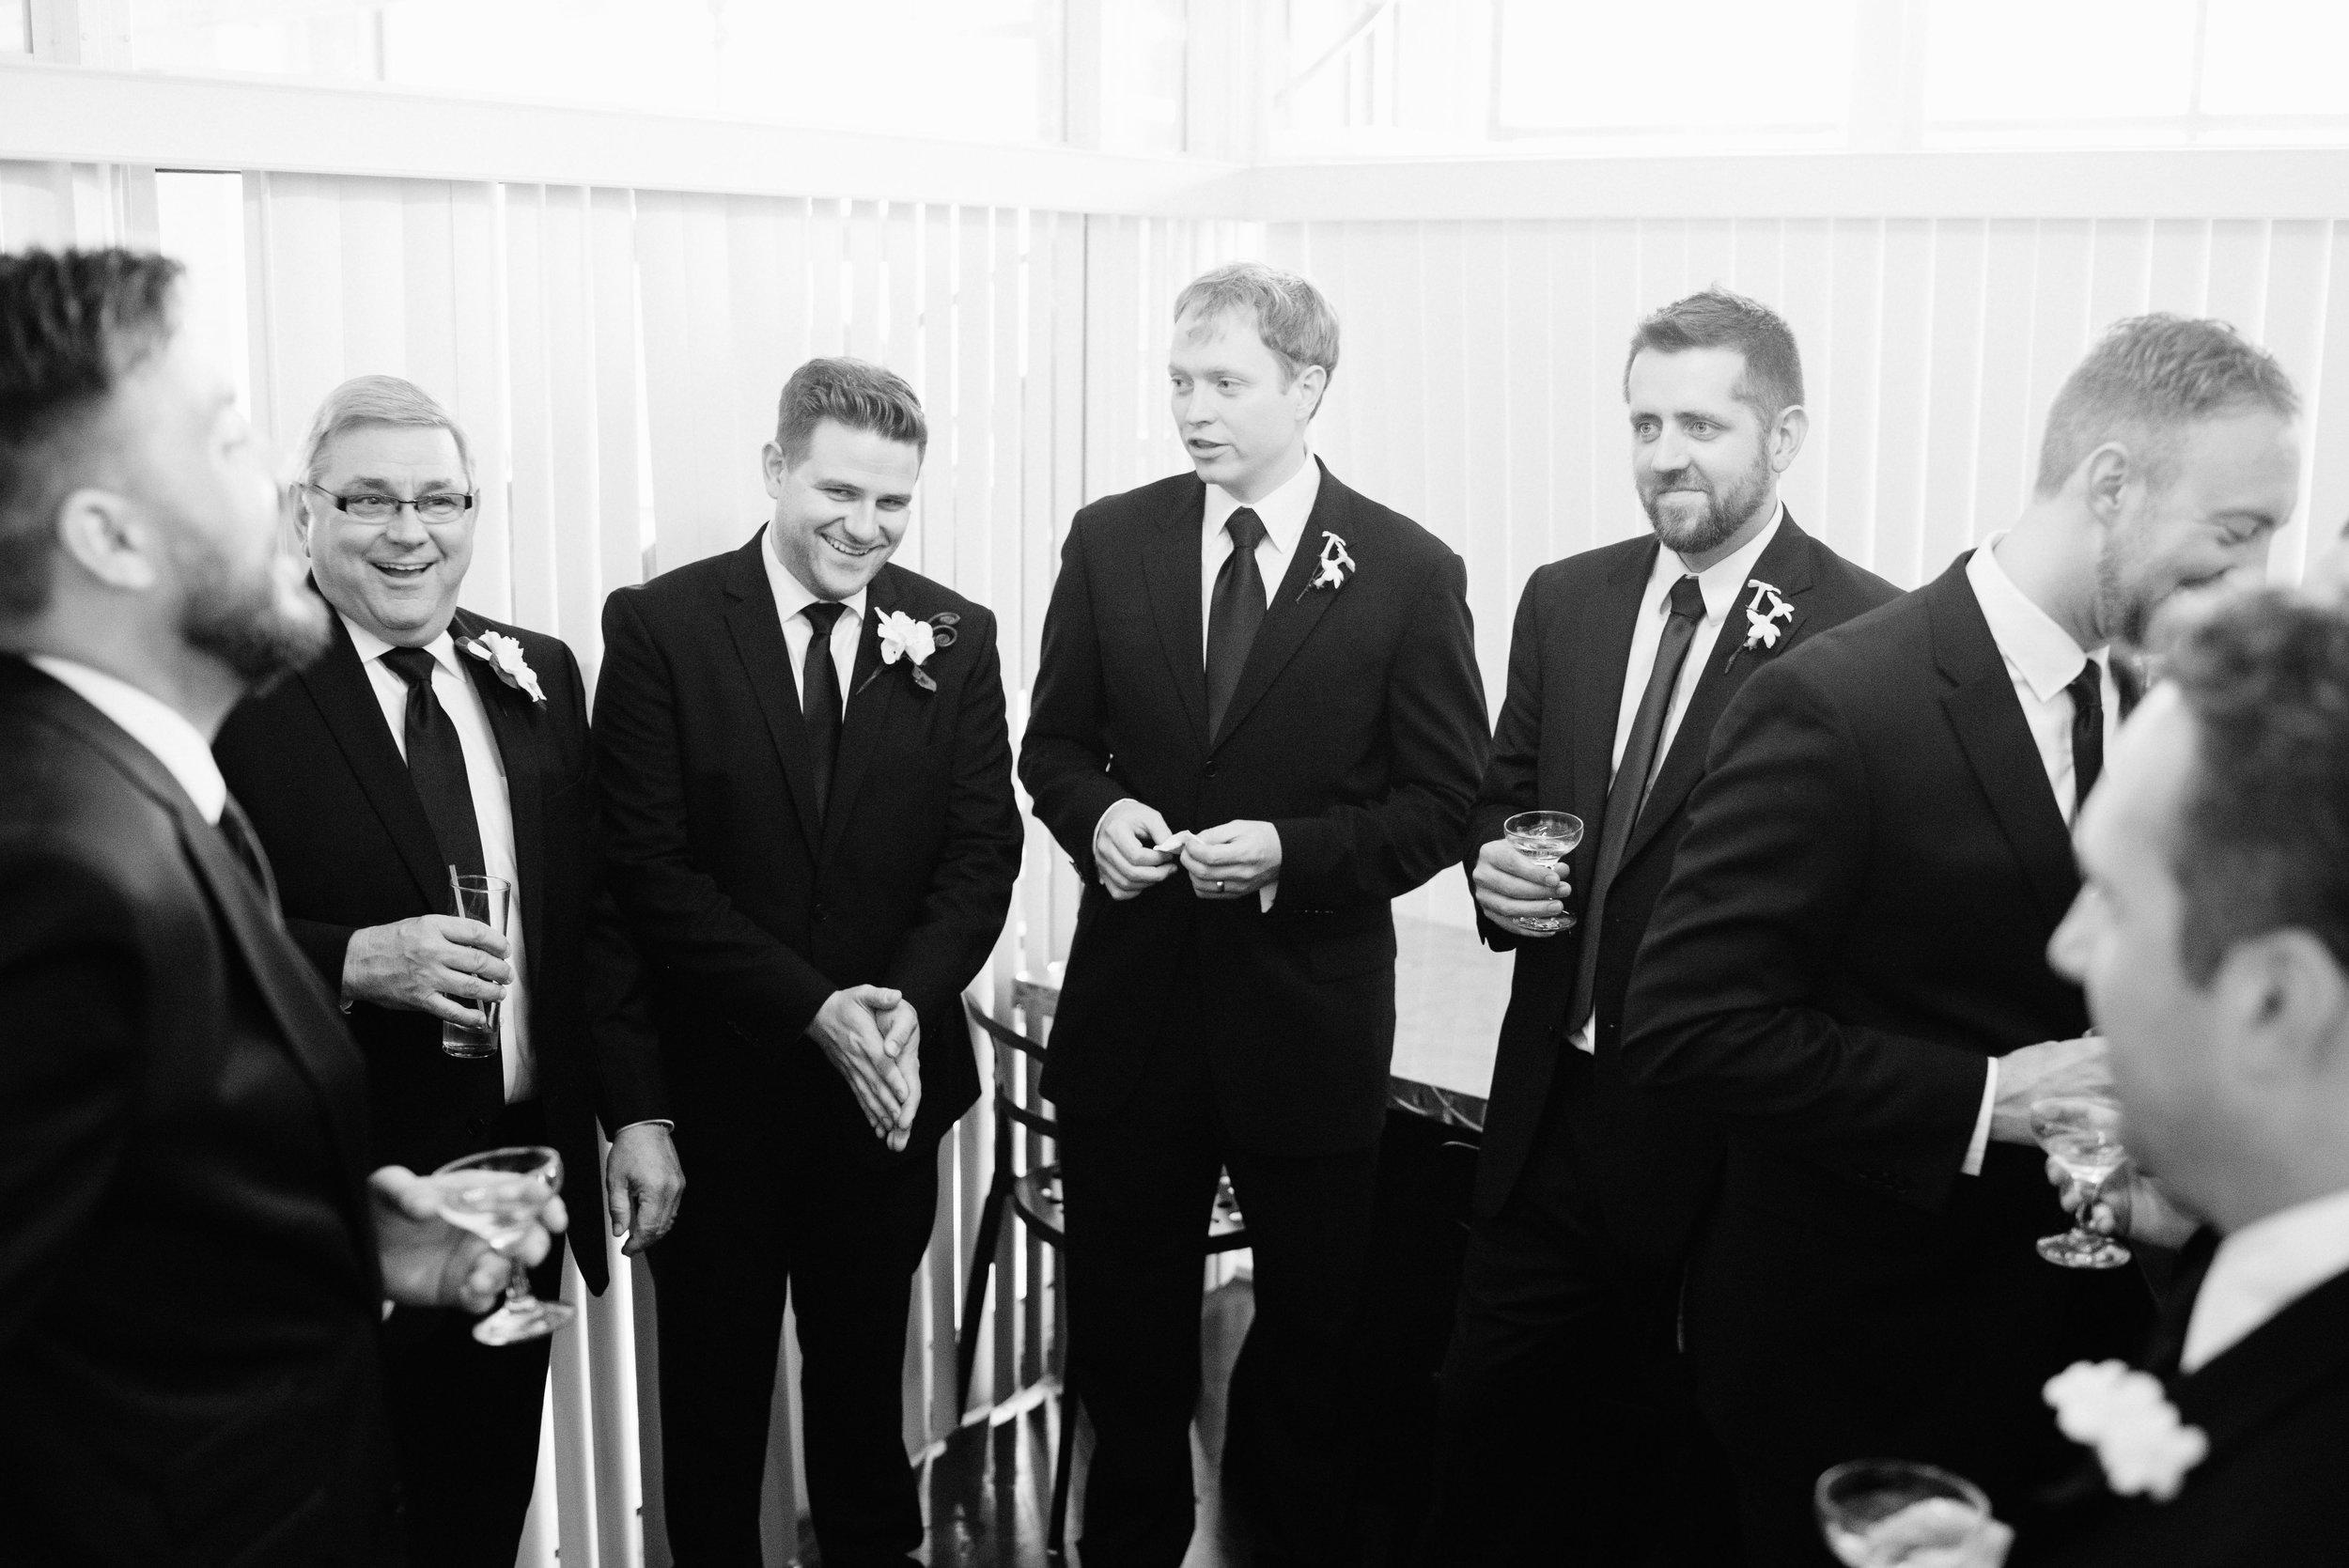 Annie-Justin-Blog-Indianapolis-Wedding-69.jpg